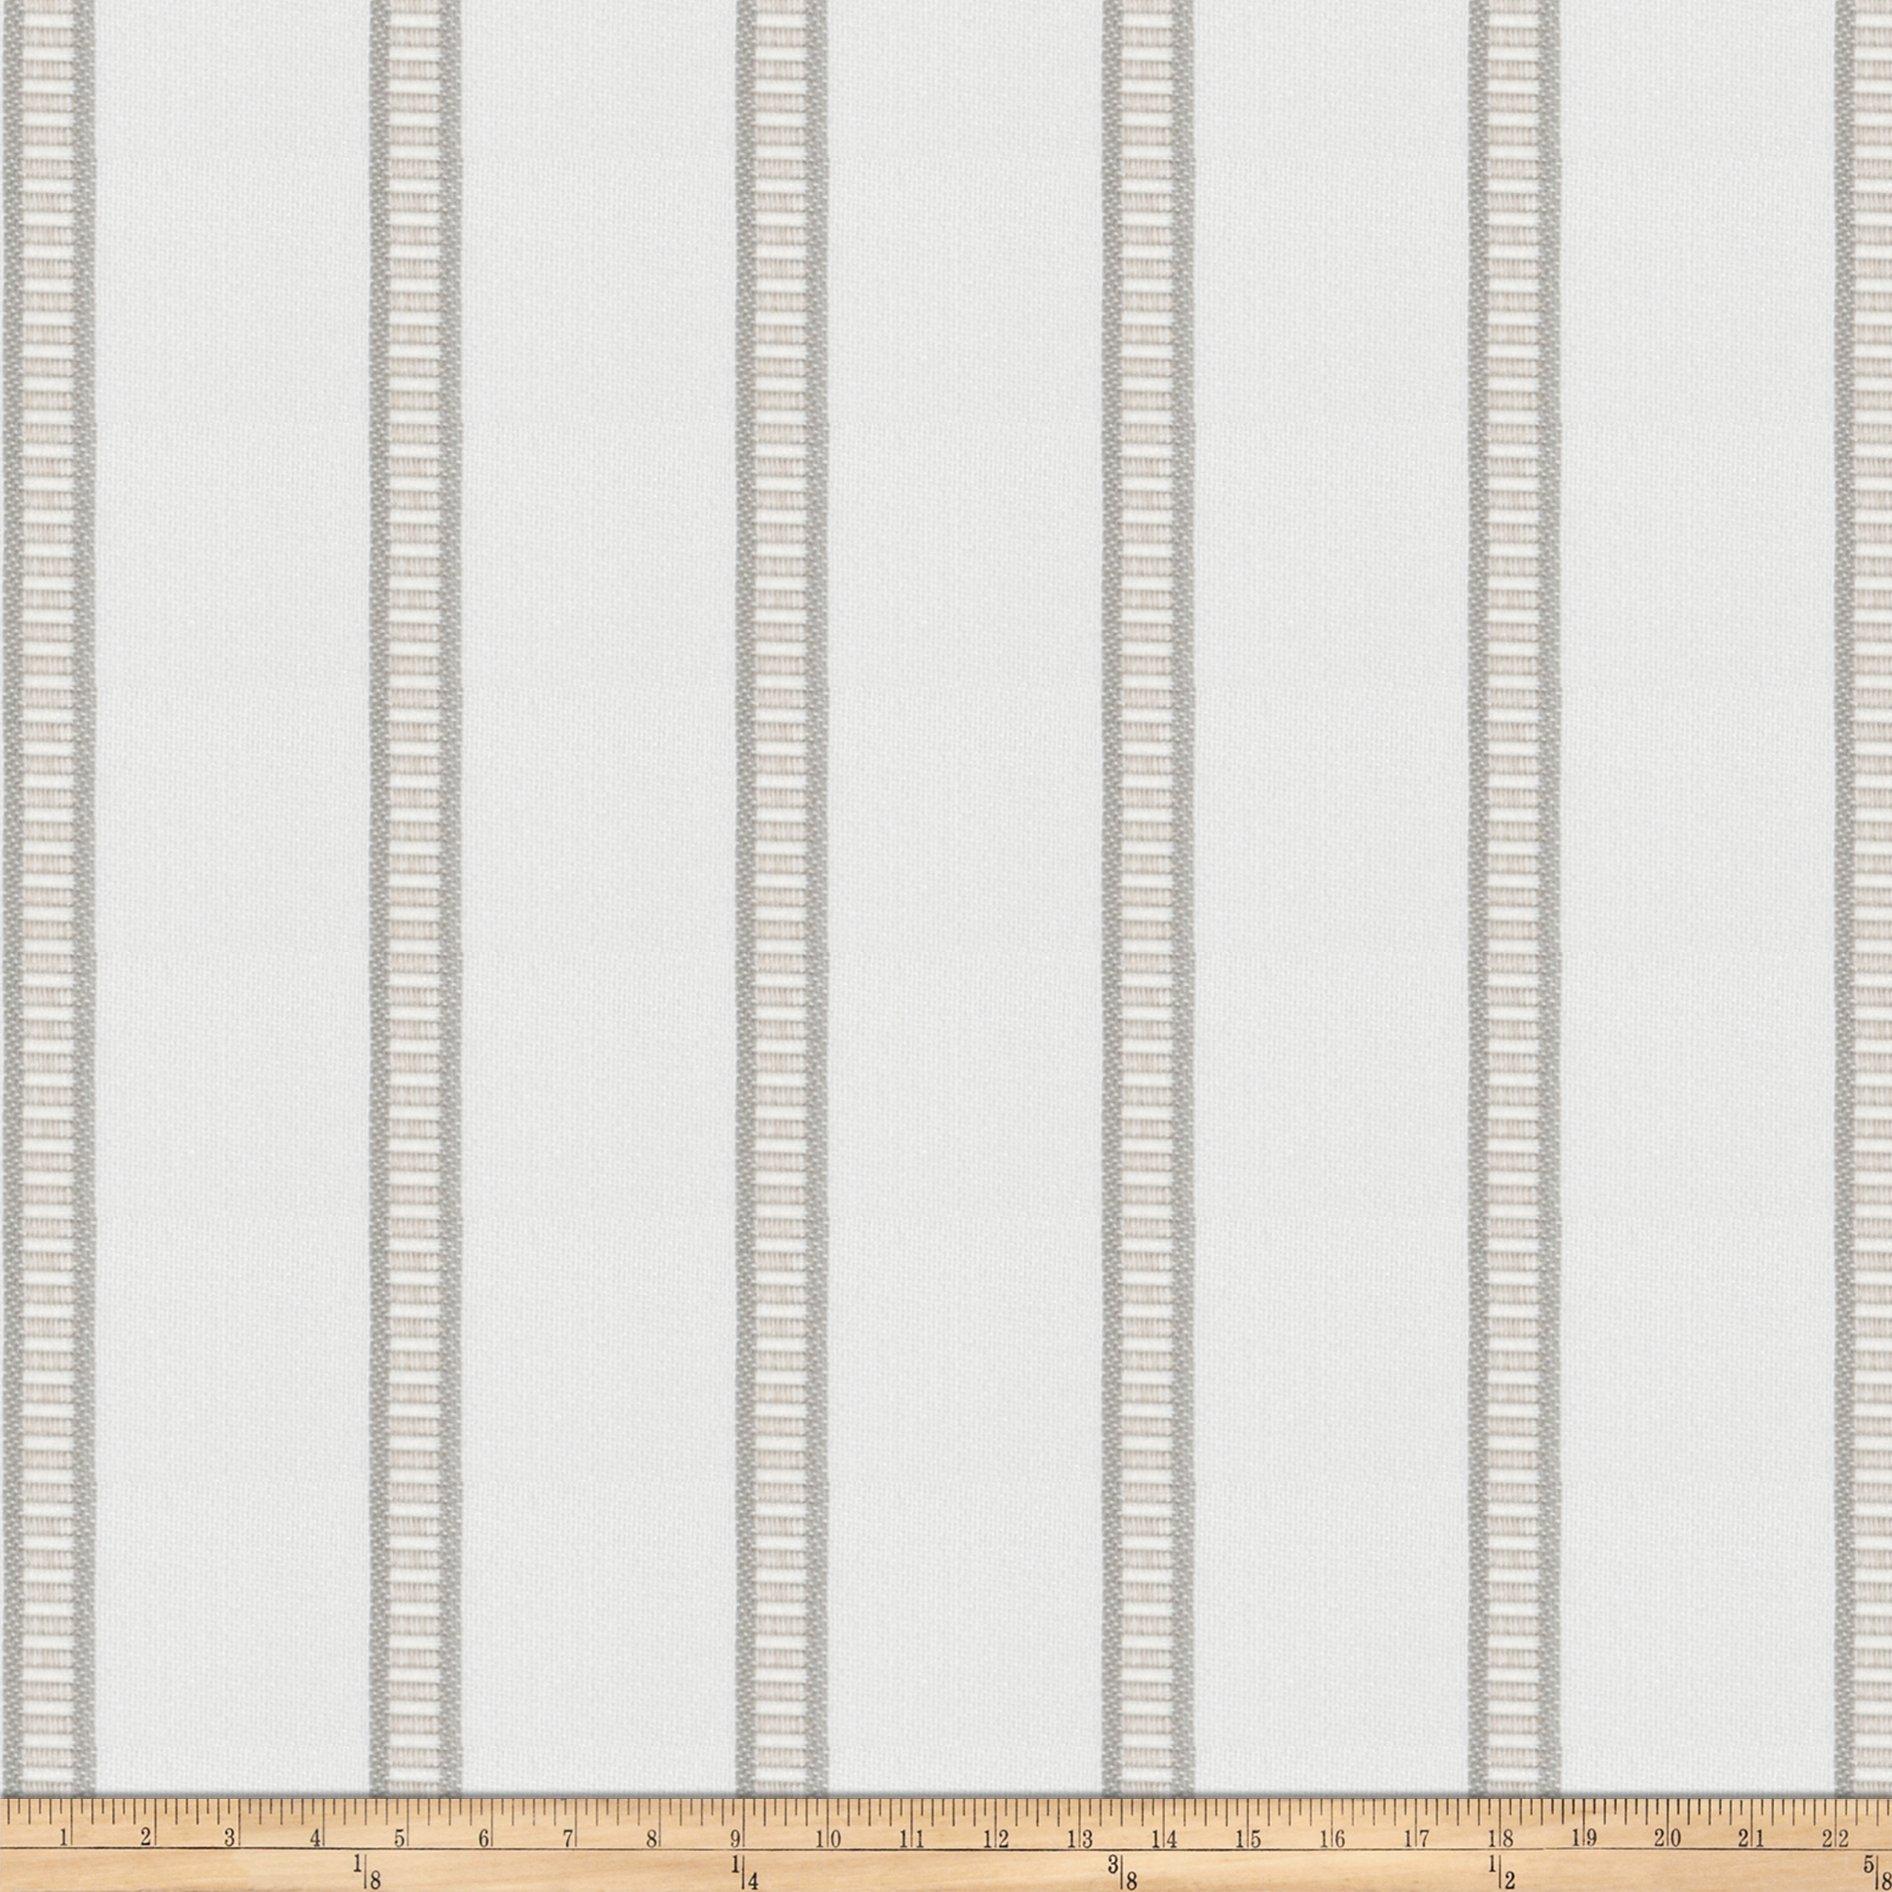 Fabricut Inc Kendall Wilkinson Sunbrella Indoor/Outdoor Pier Stripe Bleached Wood by Fabricut Inc